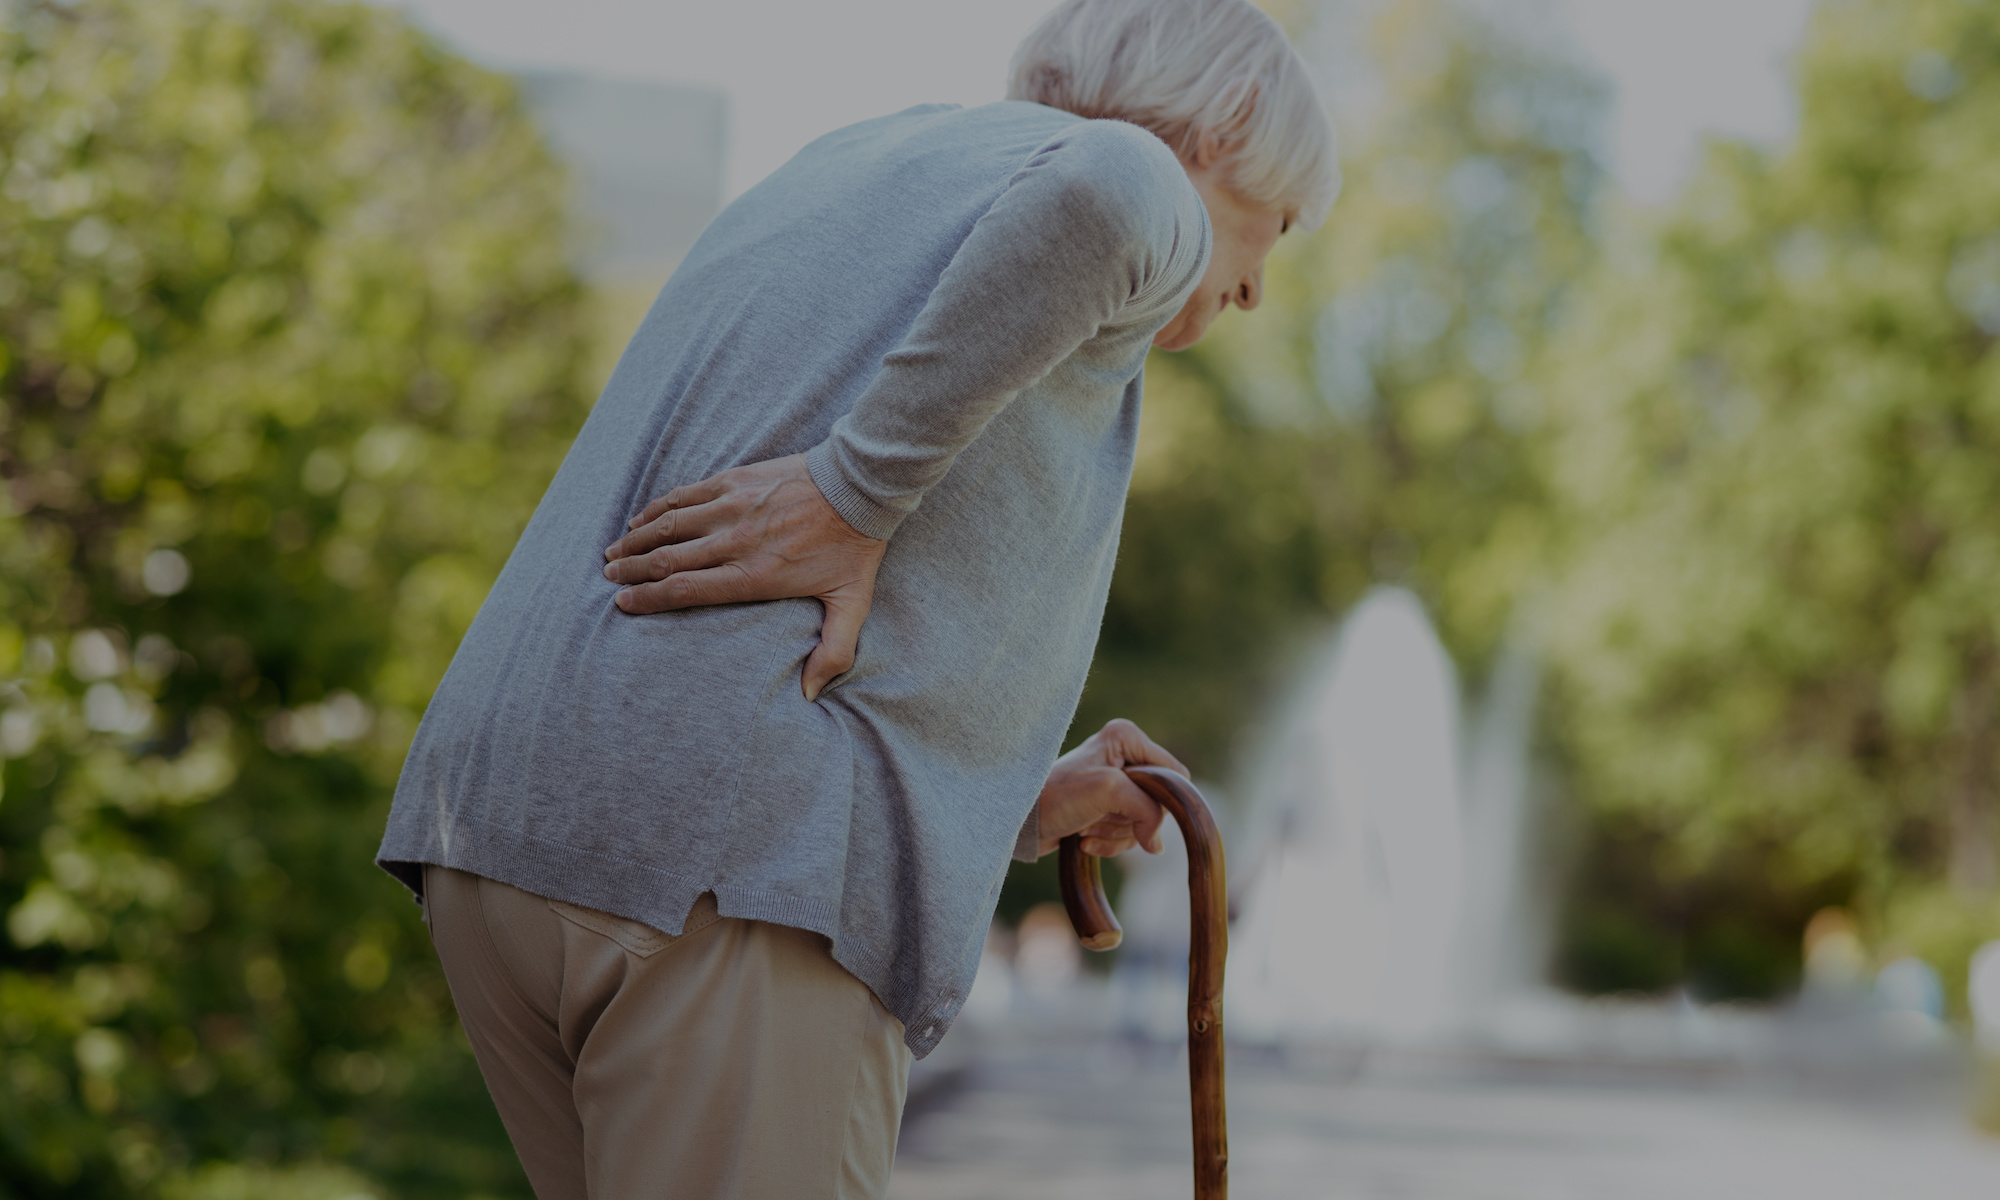 fratture vertebrali osteoporotiche